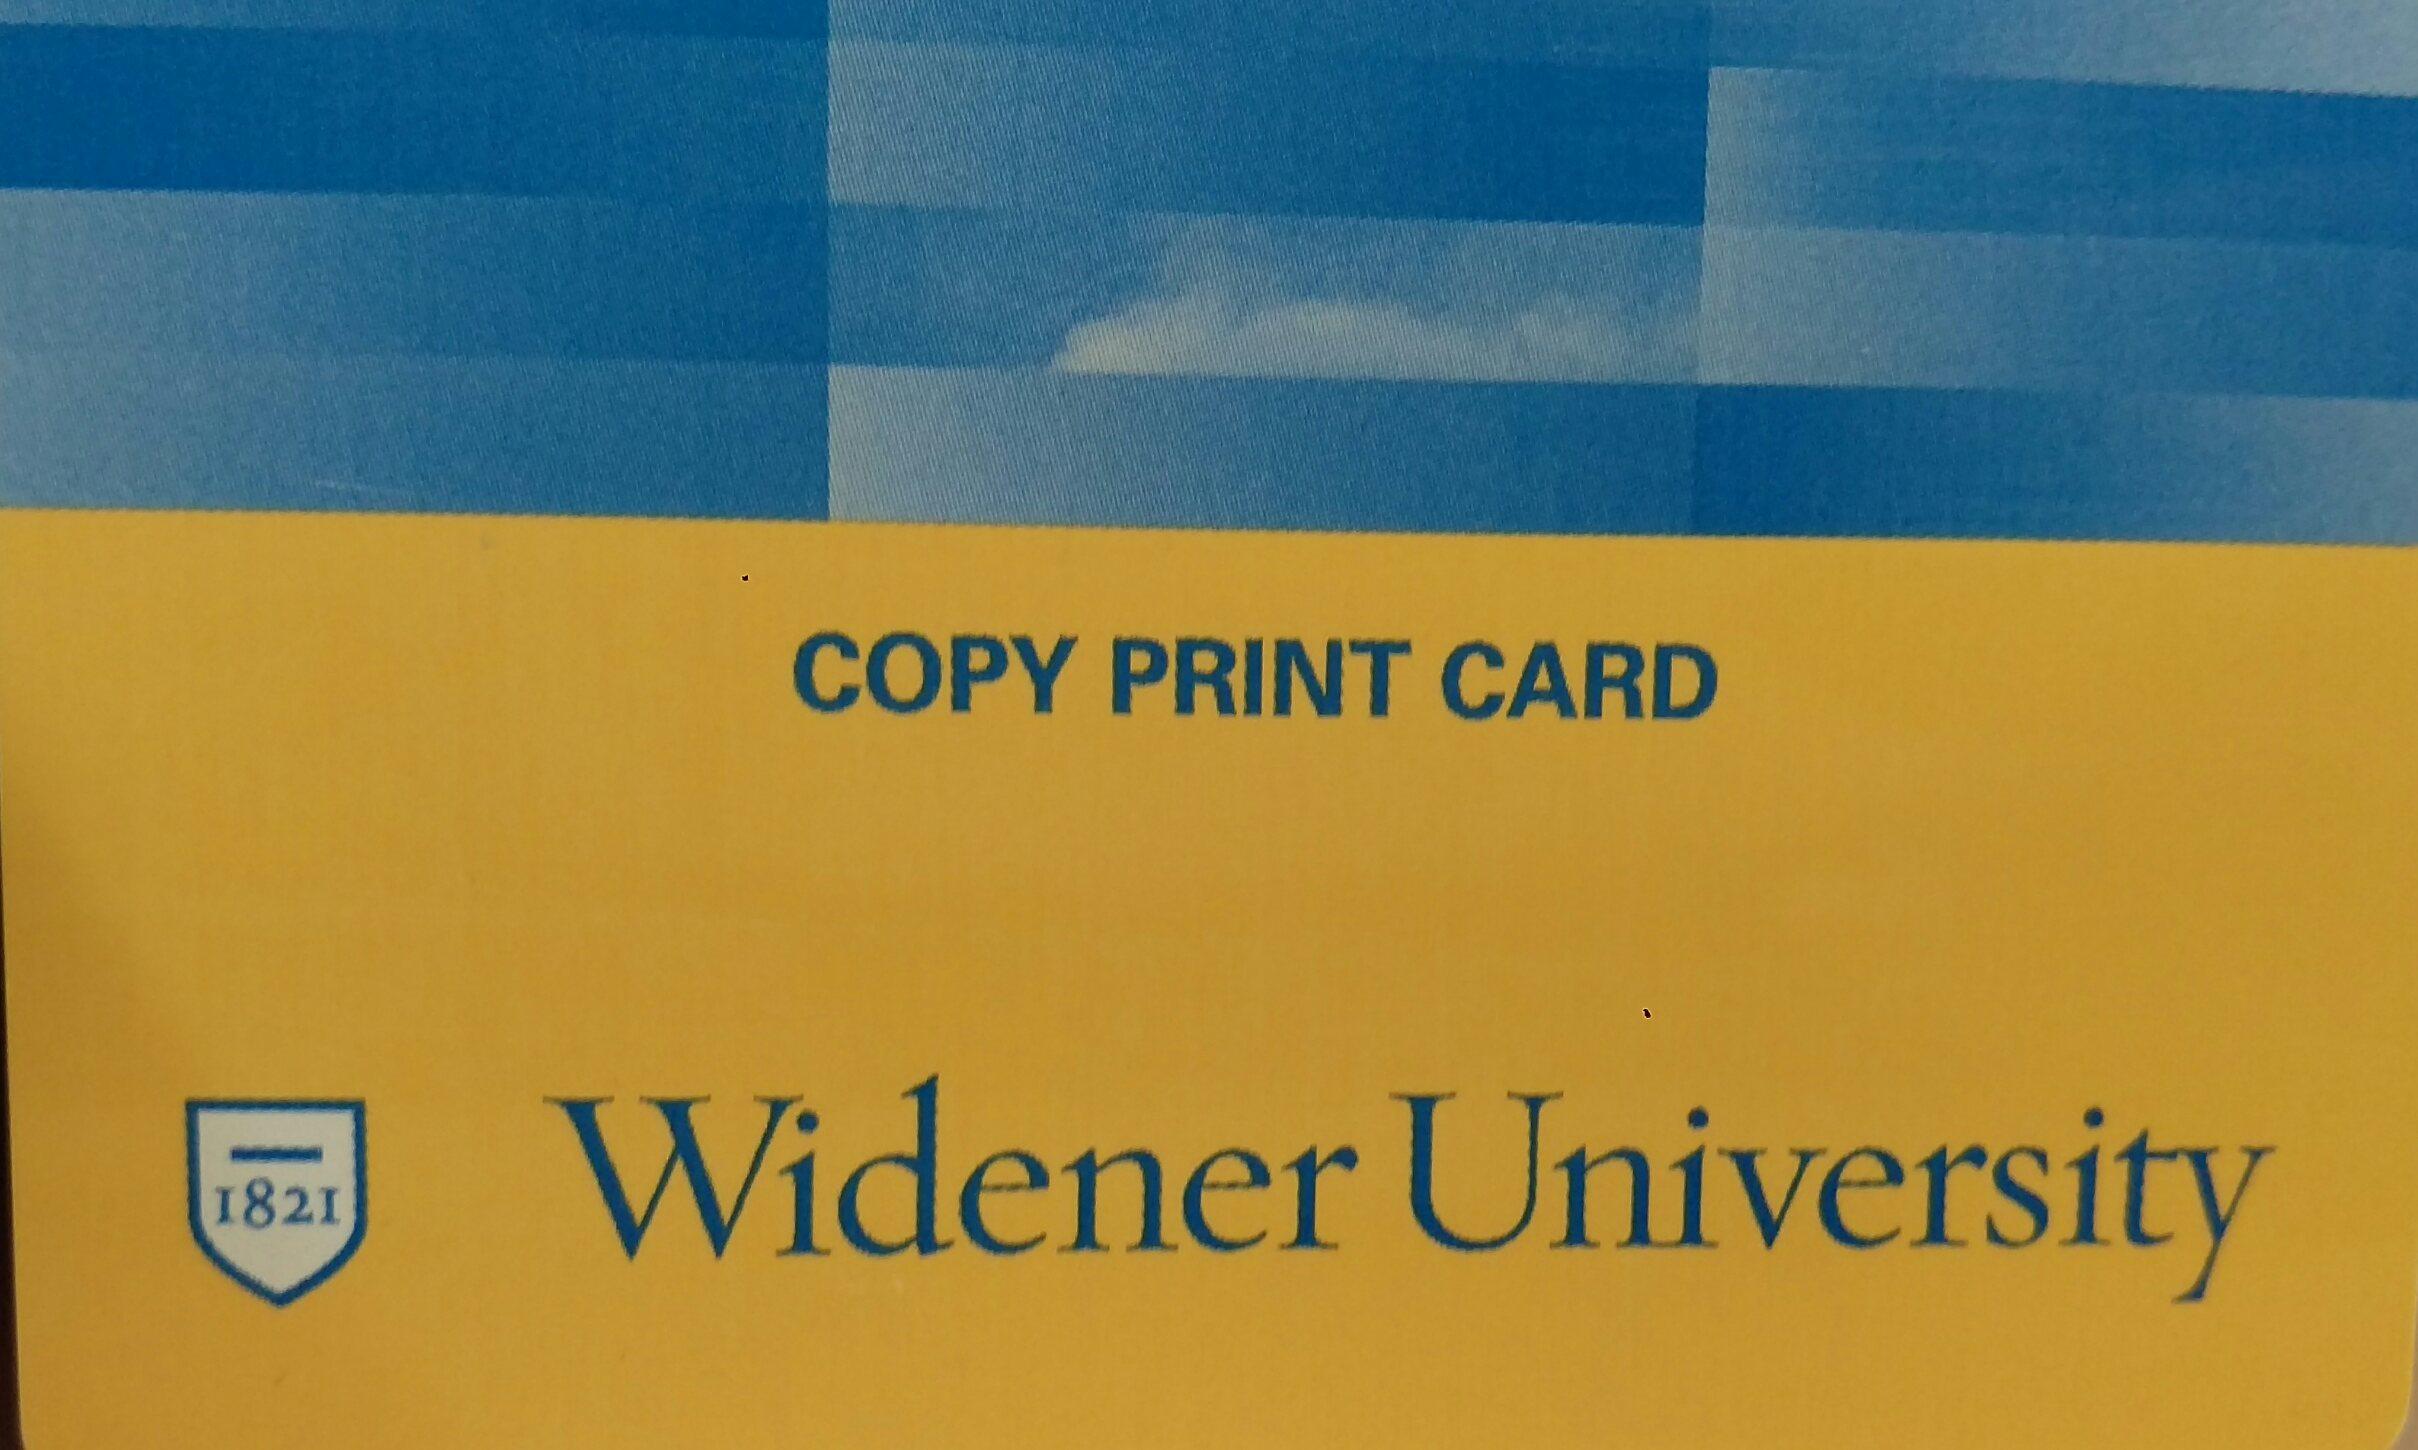 copy print card